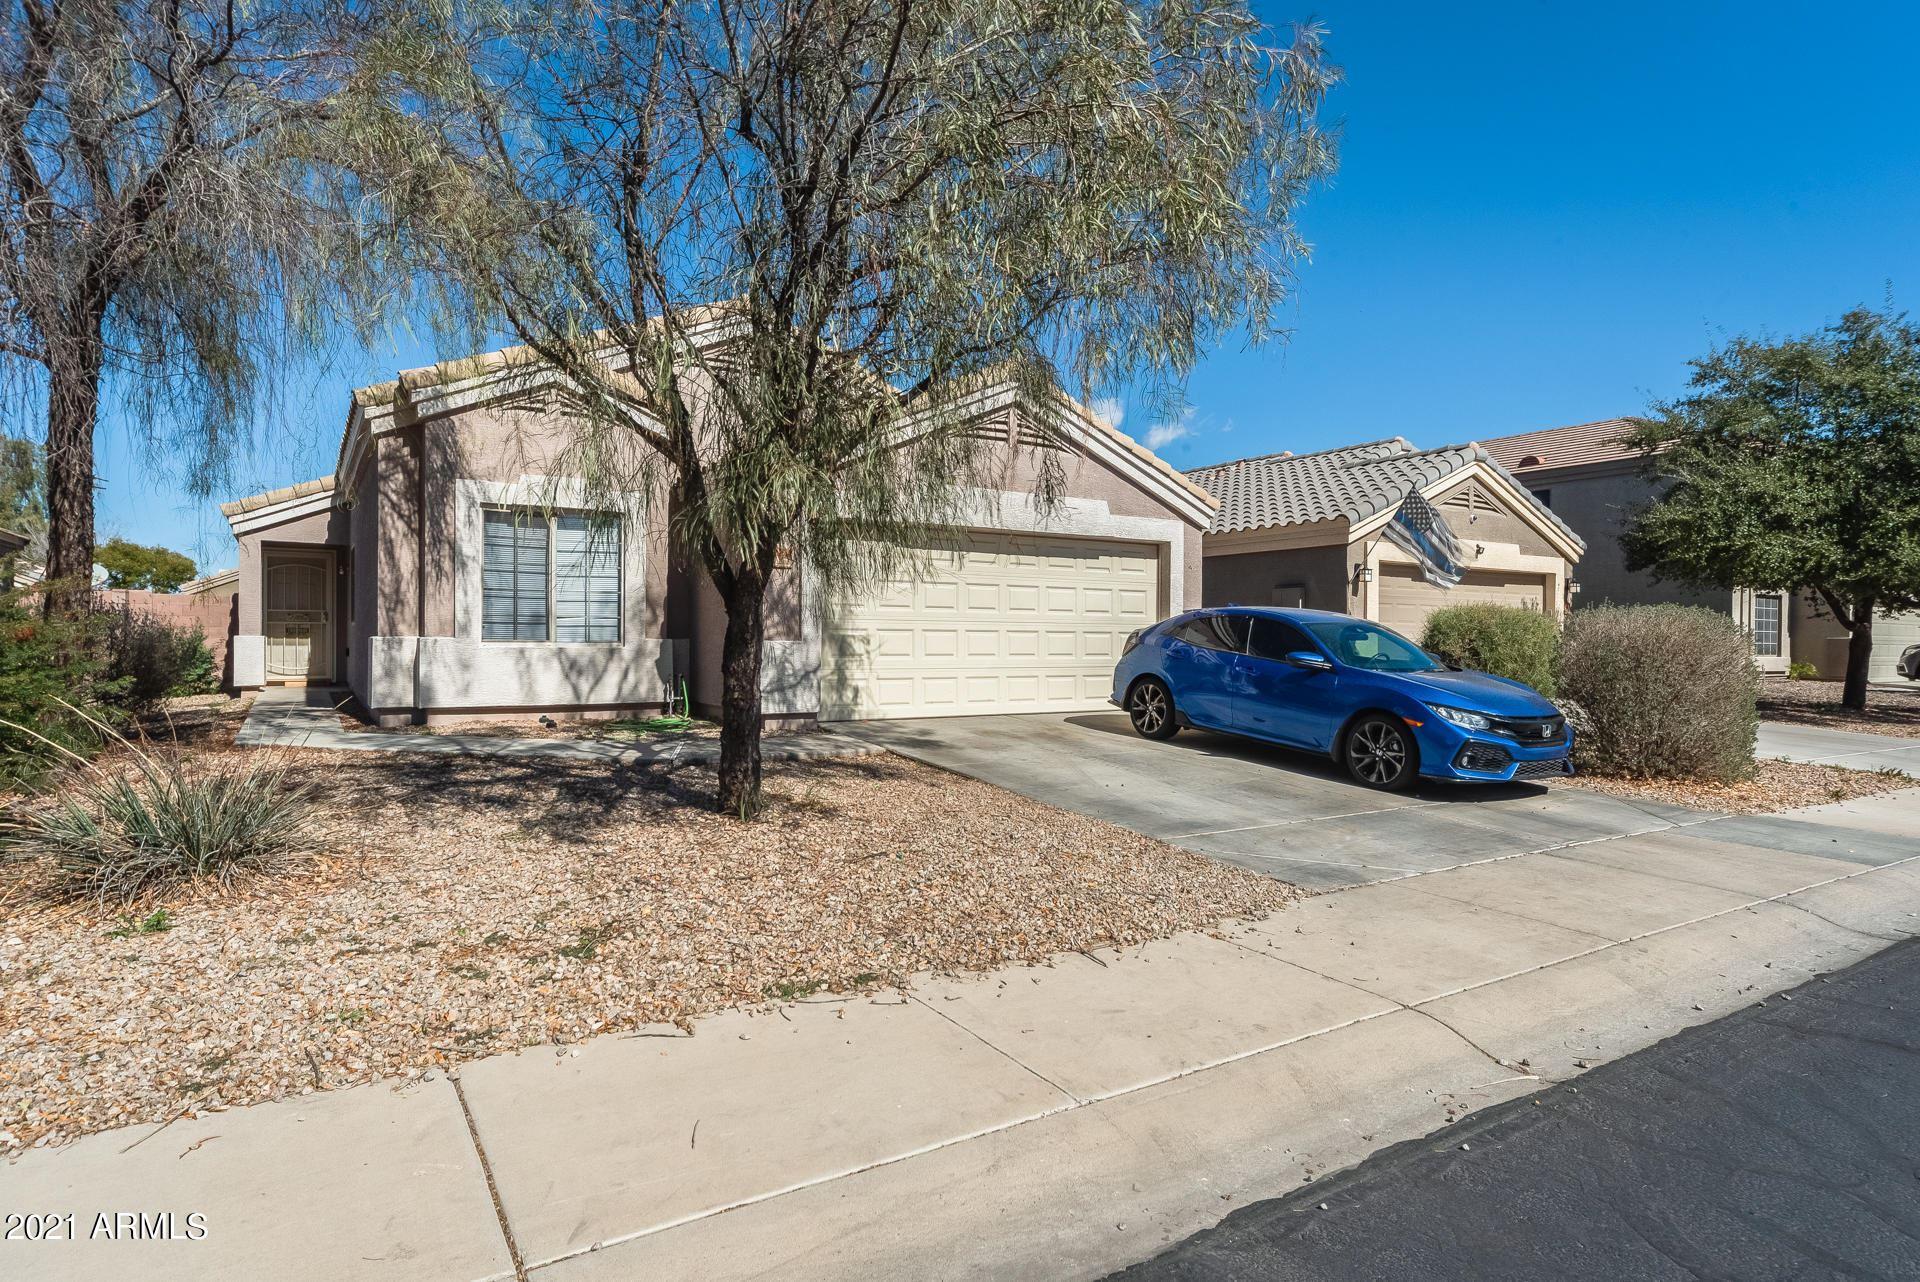 Photo of 12534 W MANDALAY Lane, El Mirage, AZ 85335 (MLS # 6195783)